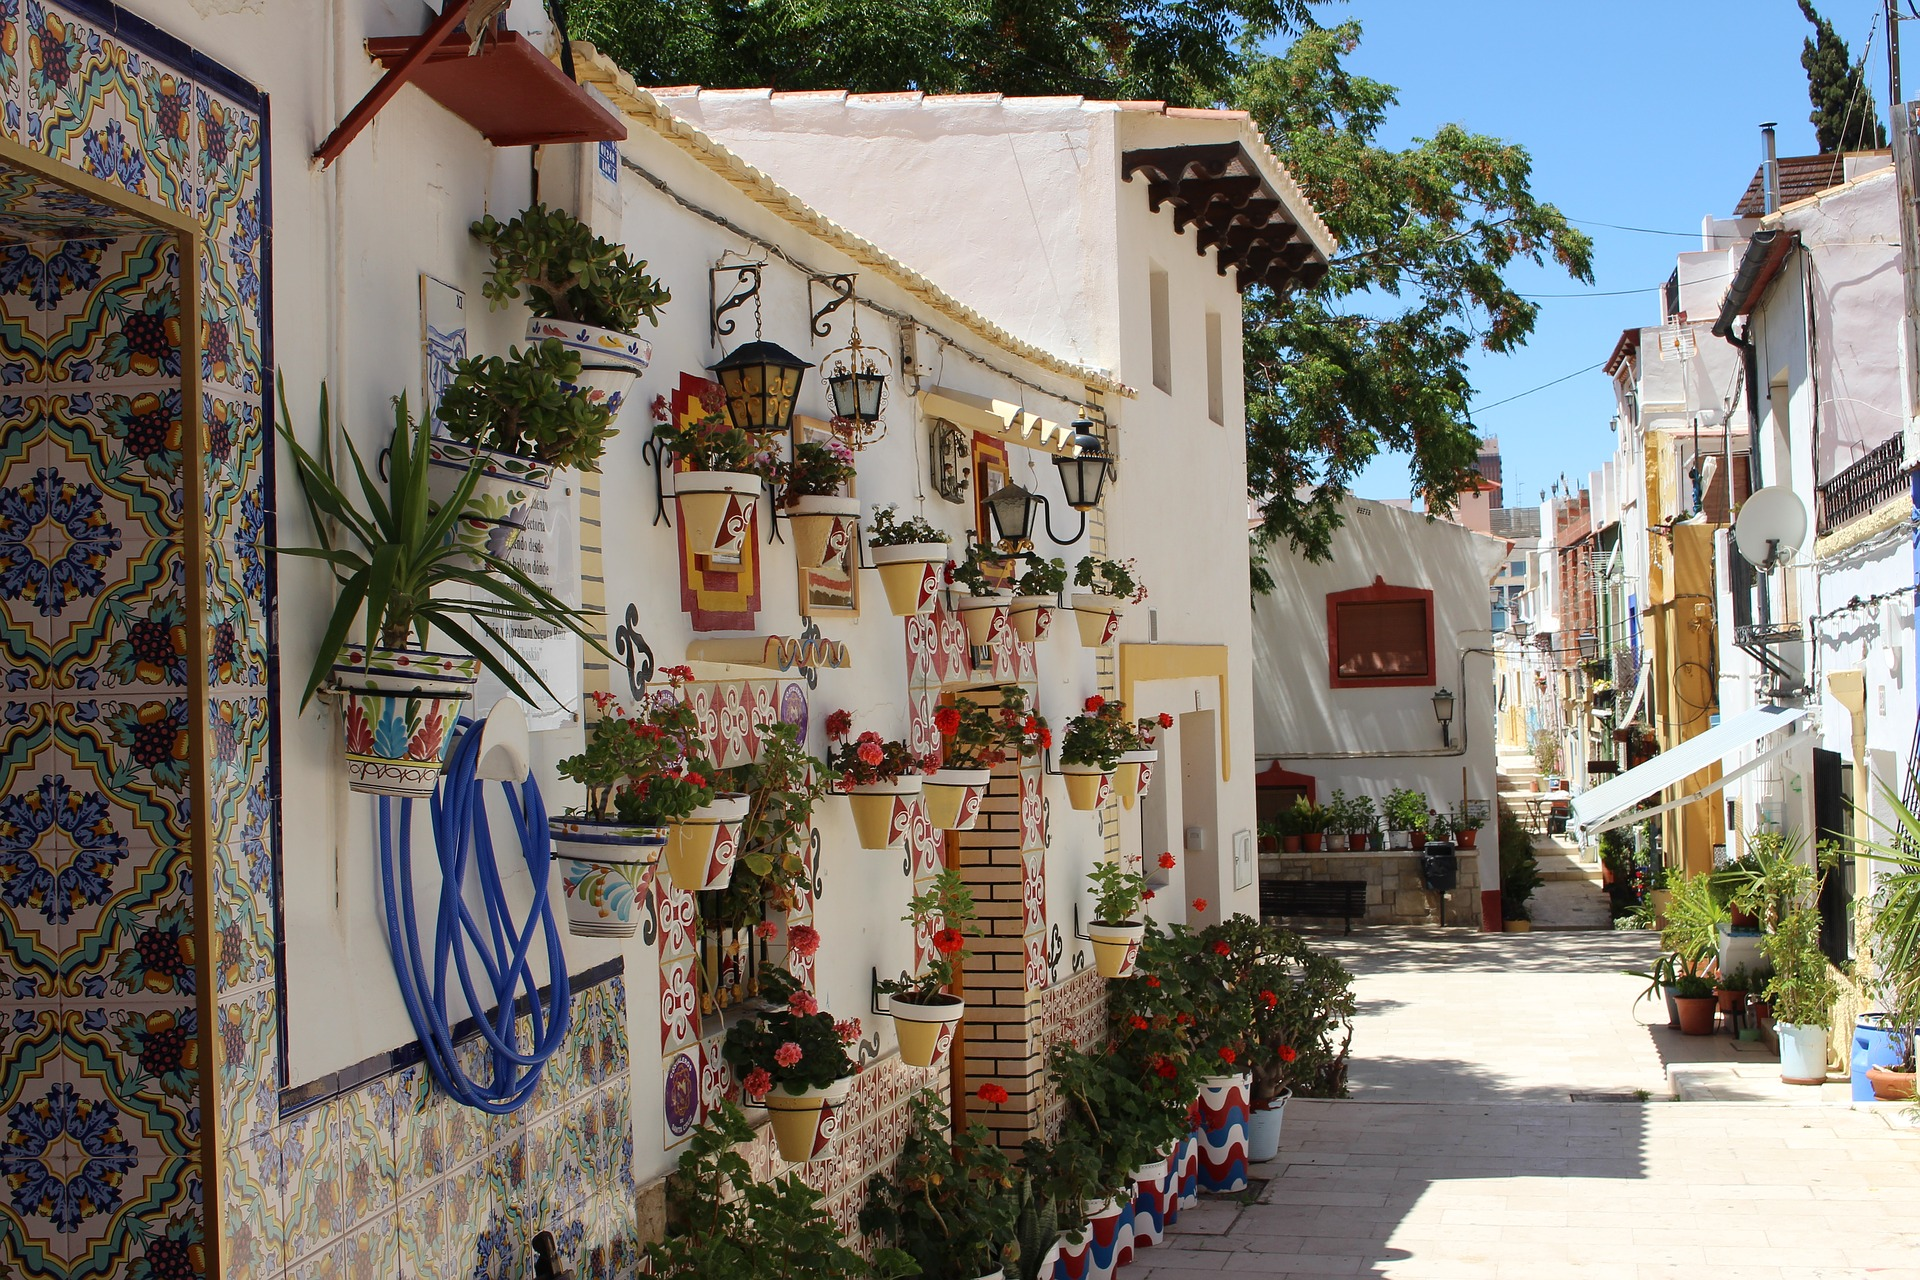 Beautiful pots of flowers in Alicante, Spain